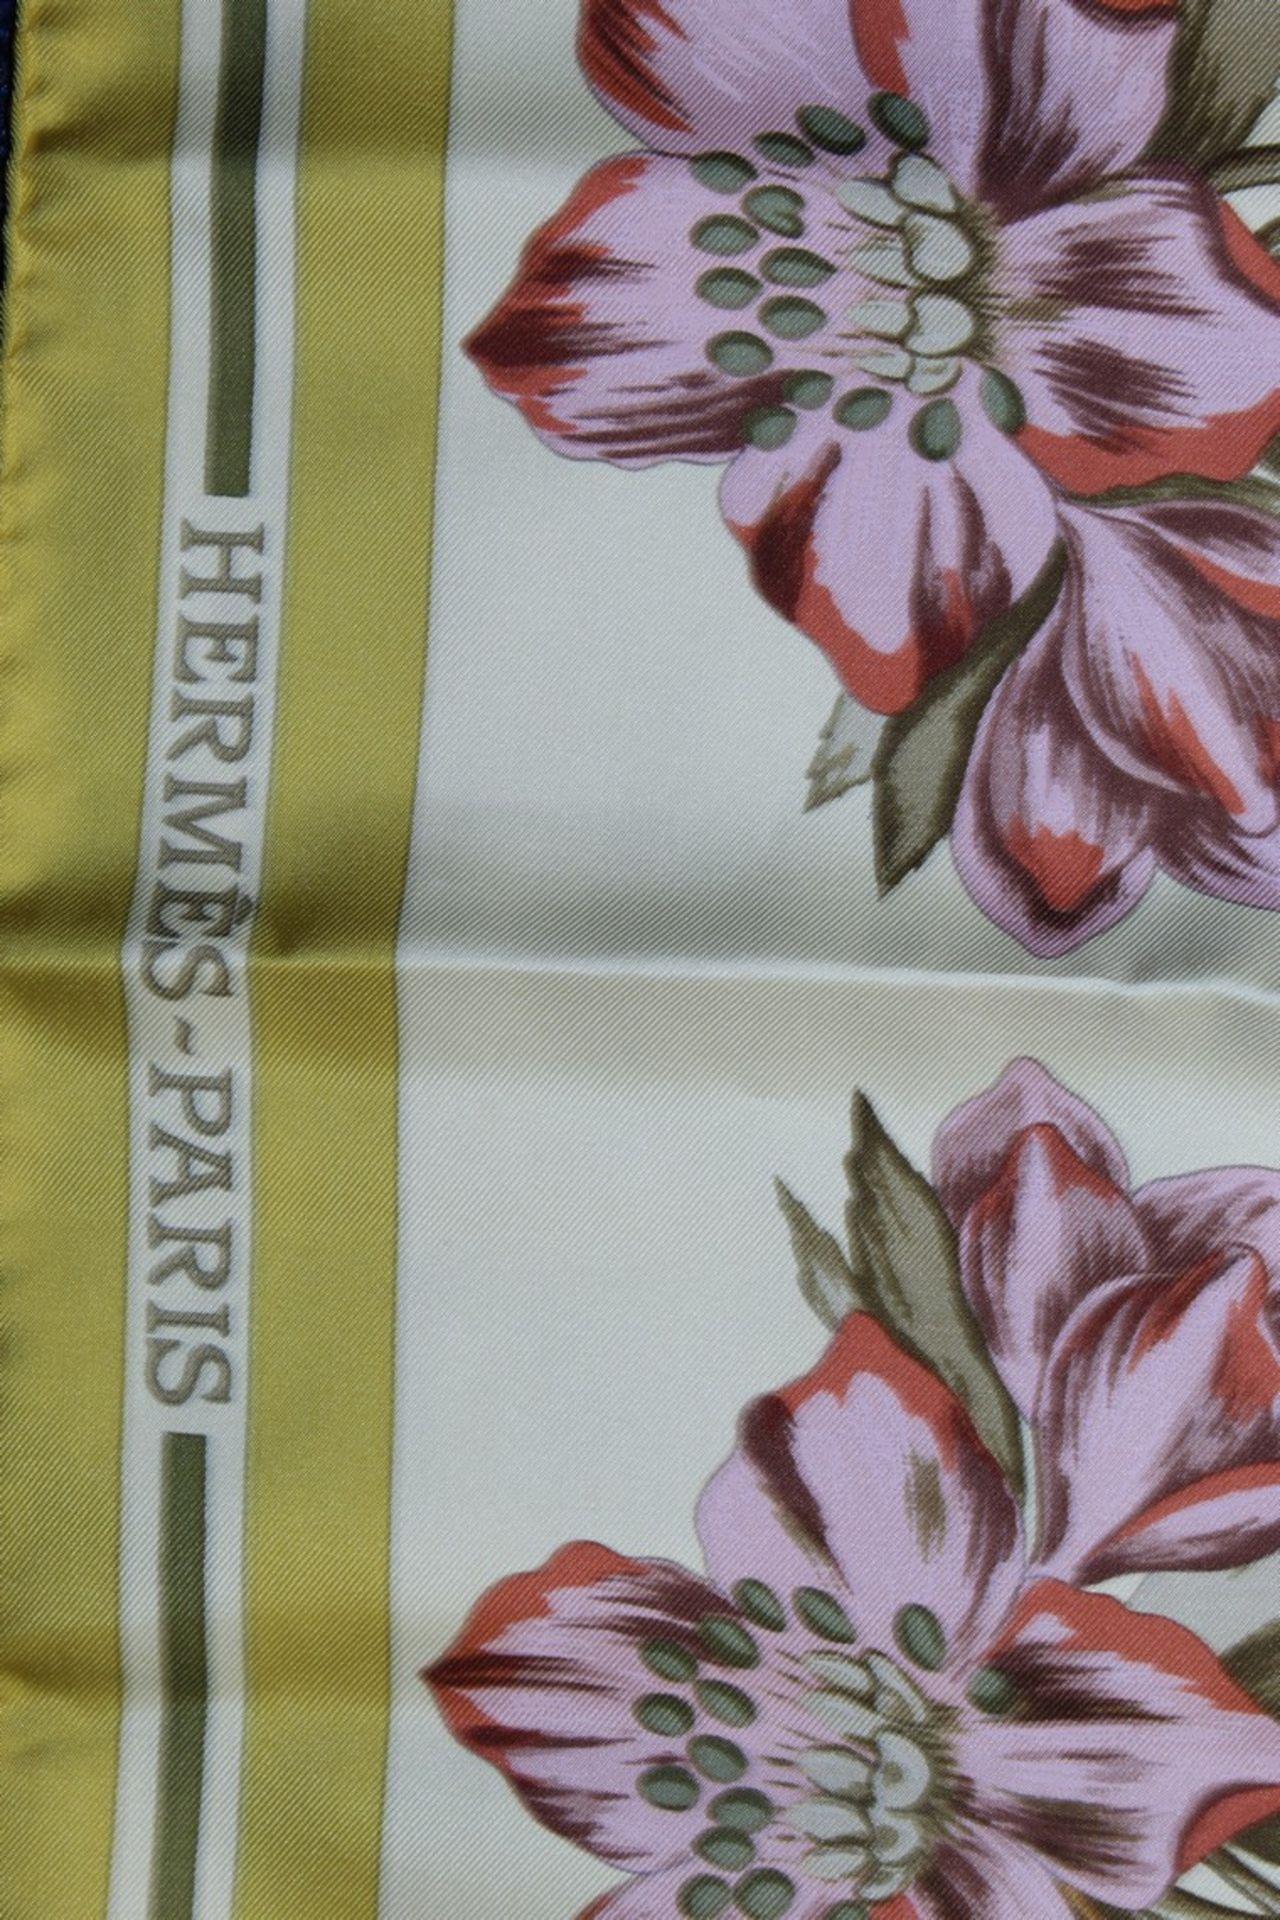 RRP £680 Hermes 100% Twill Silk Scarf, Aquilegia Othonis By Niki Goulandris, Yellow/Green, 90X90Cm - Image 3 of 5